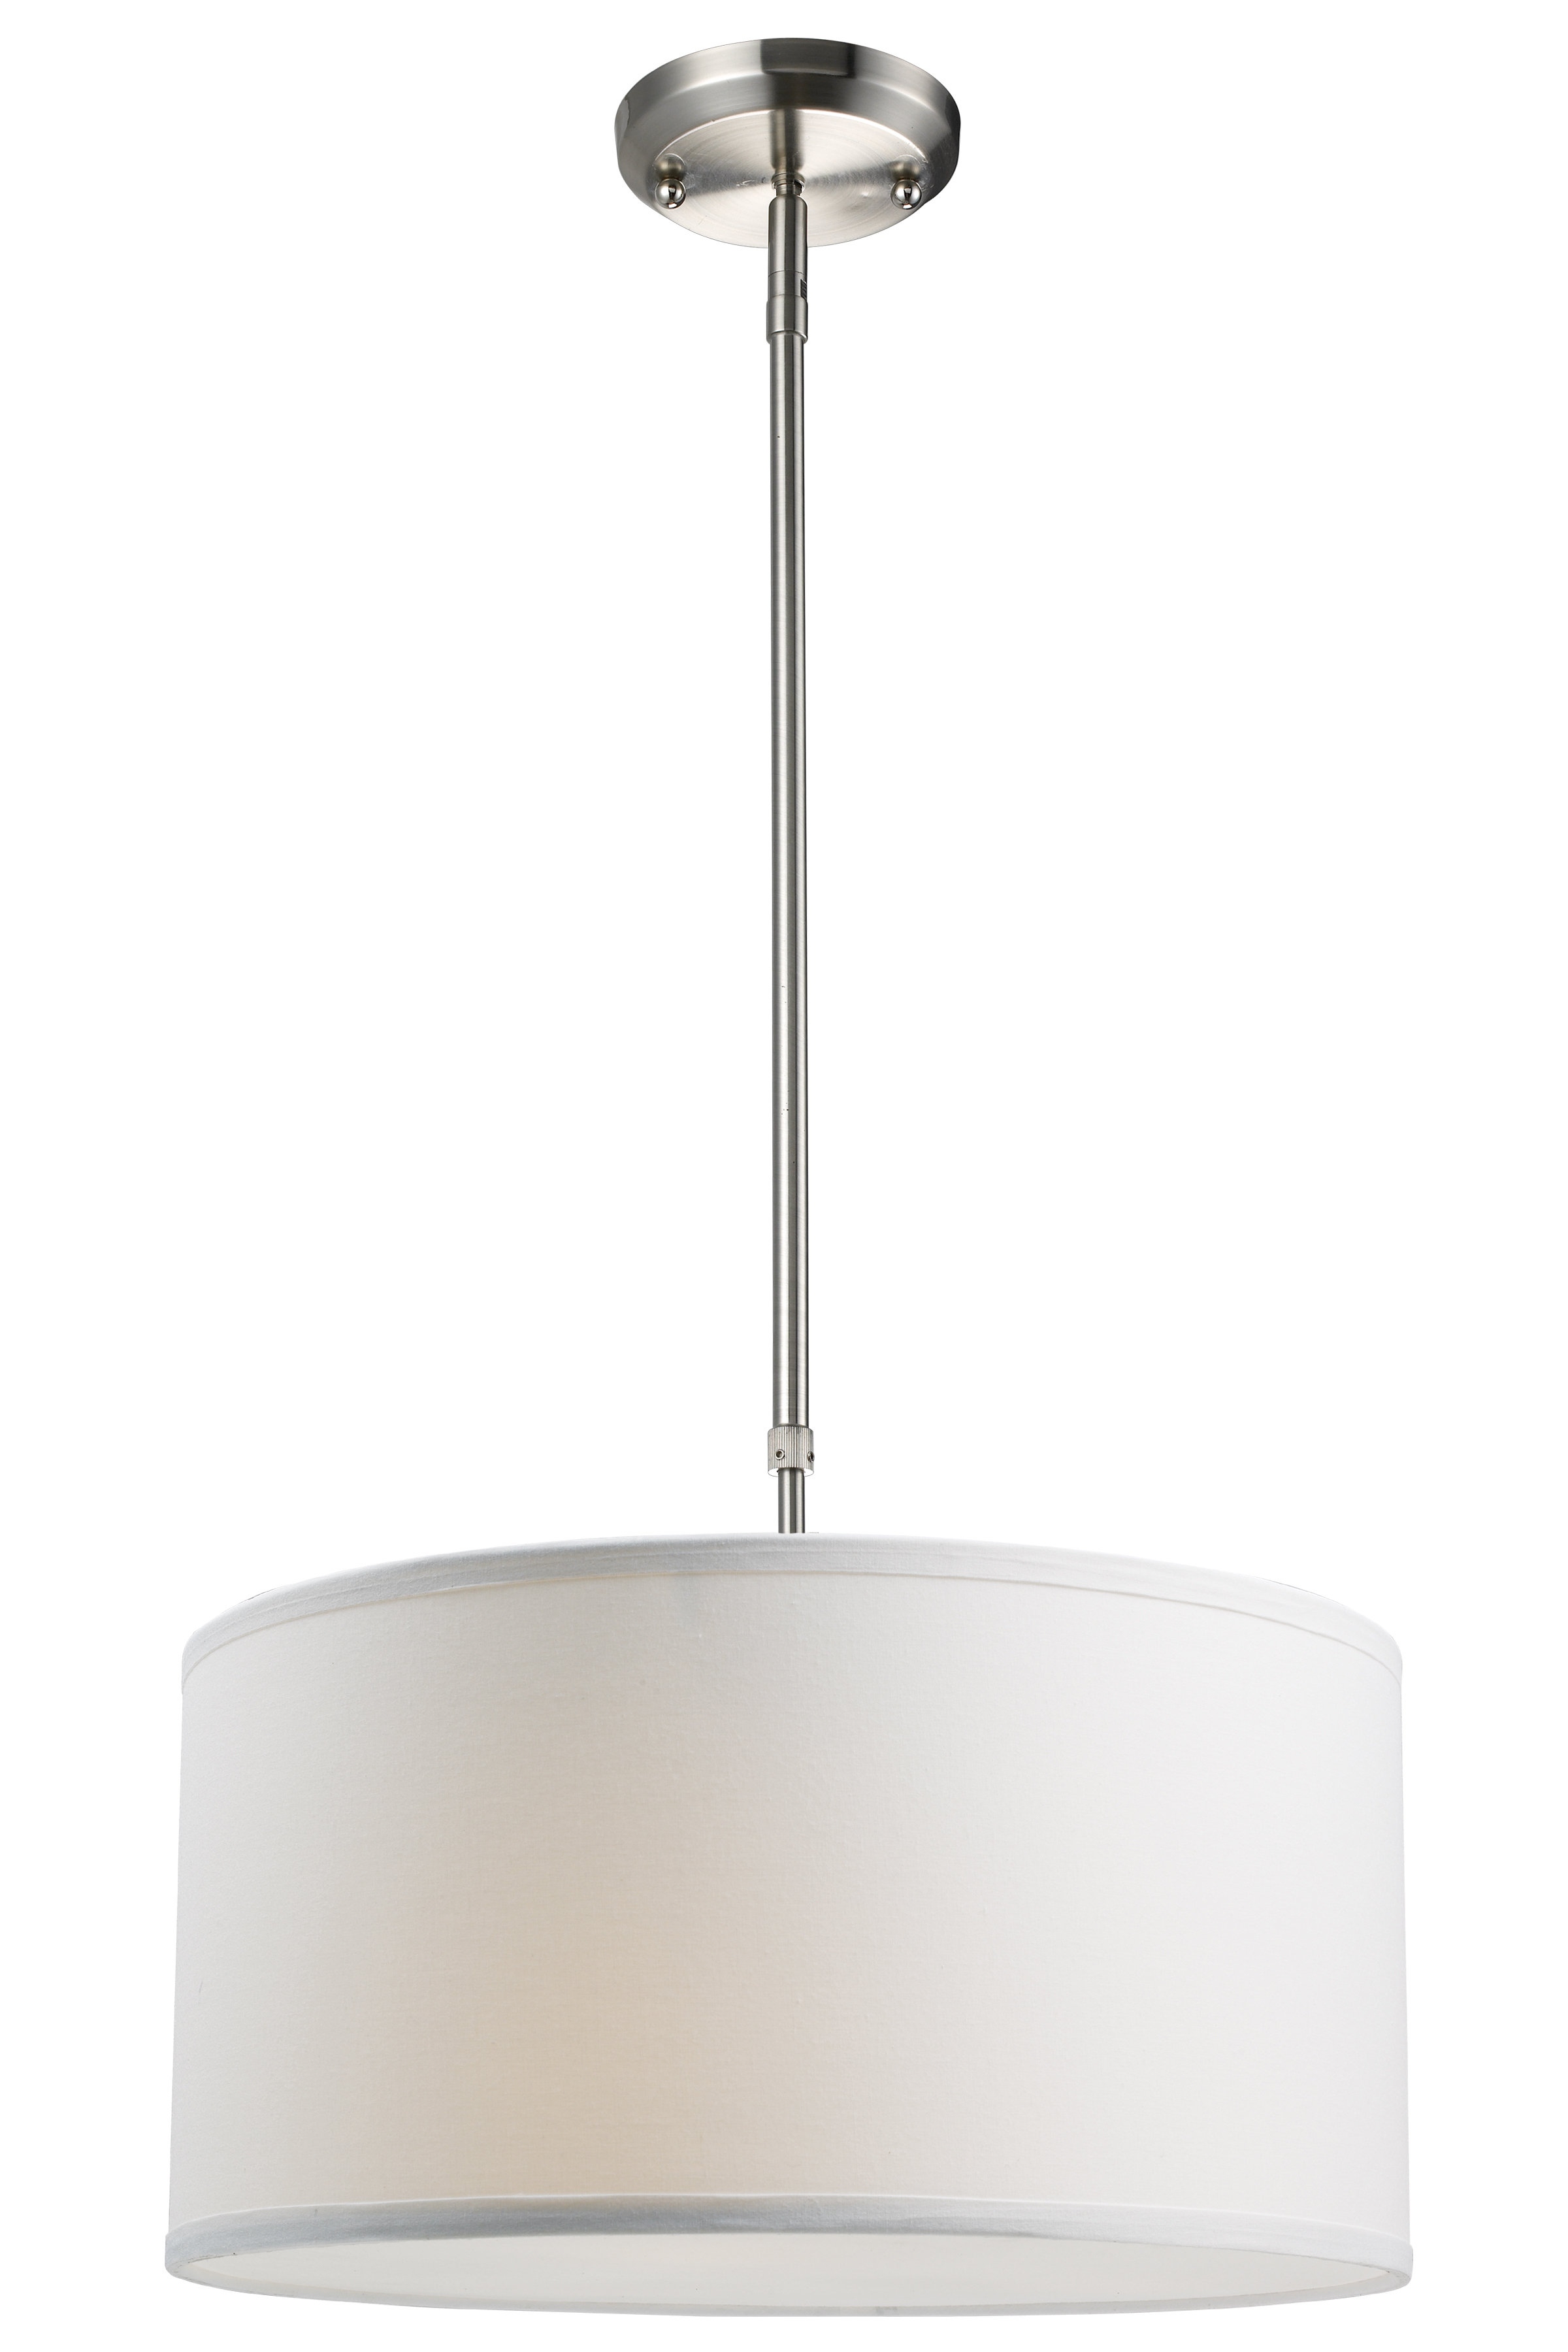 Radtke 3 Light Single Drum Pendants In Widely Used Kasey 3 Light Single Drum Pendant (View 3 of 20)